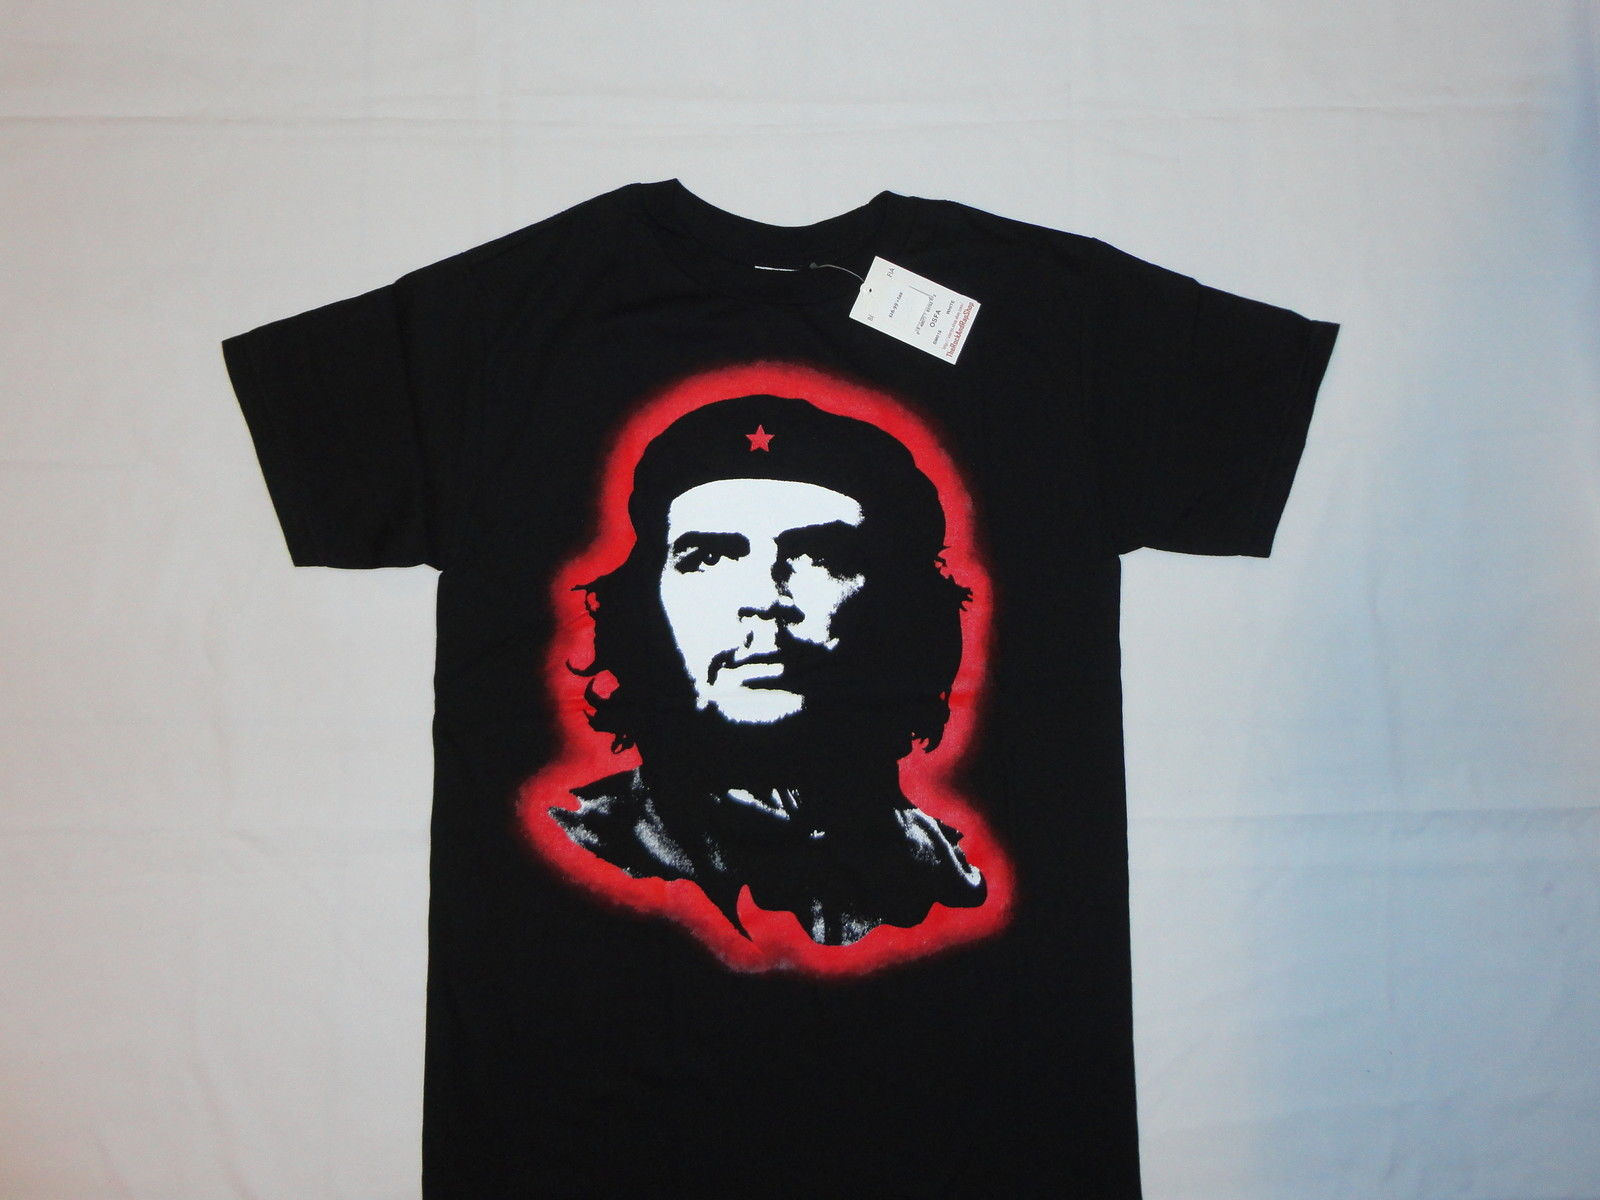 Revolucionario CHE GUEVARA nueva camiseta S M L XL 2XL Estrella Roja CUBA ejército guerra de México Camiseta de manga corta Tops camiseta